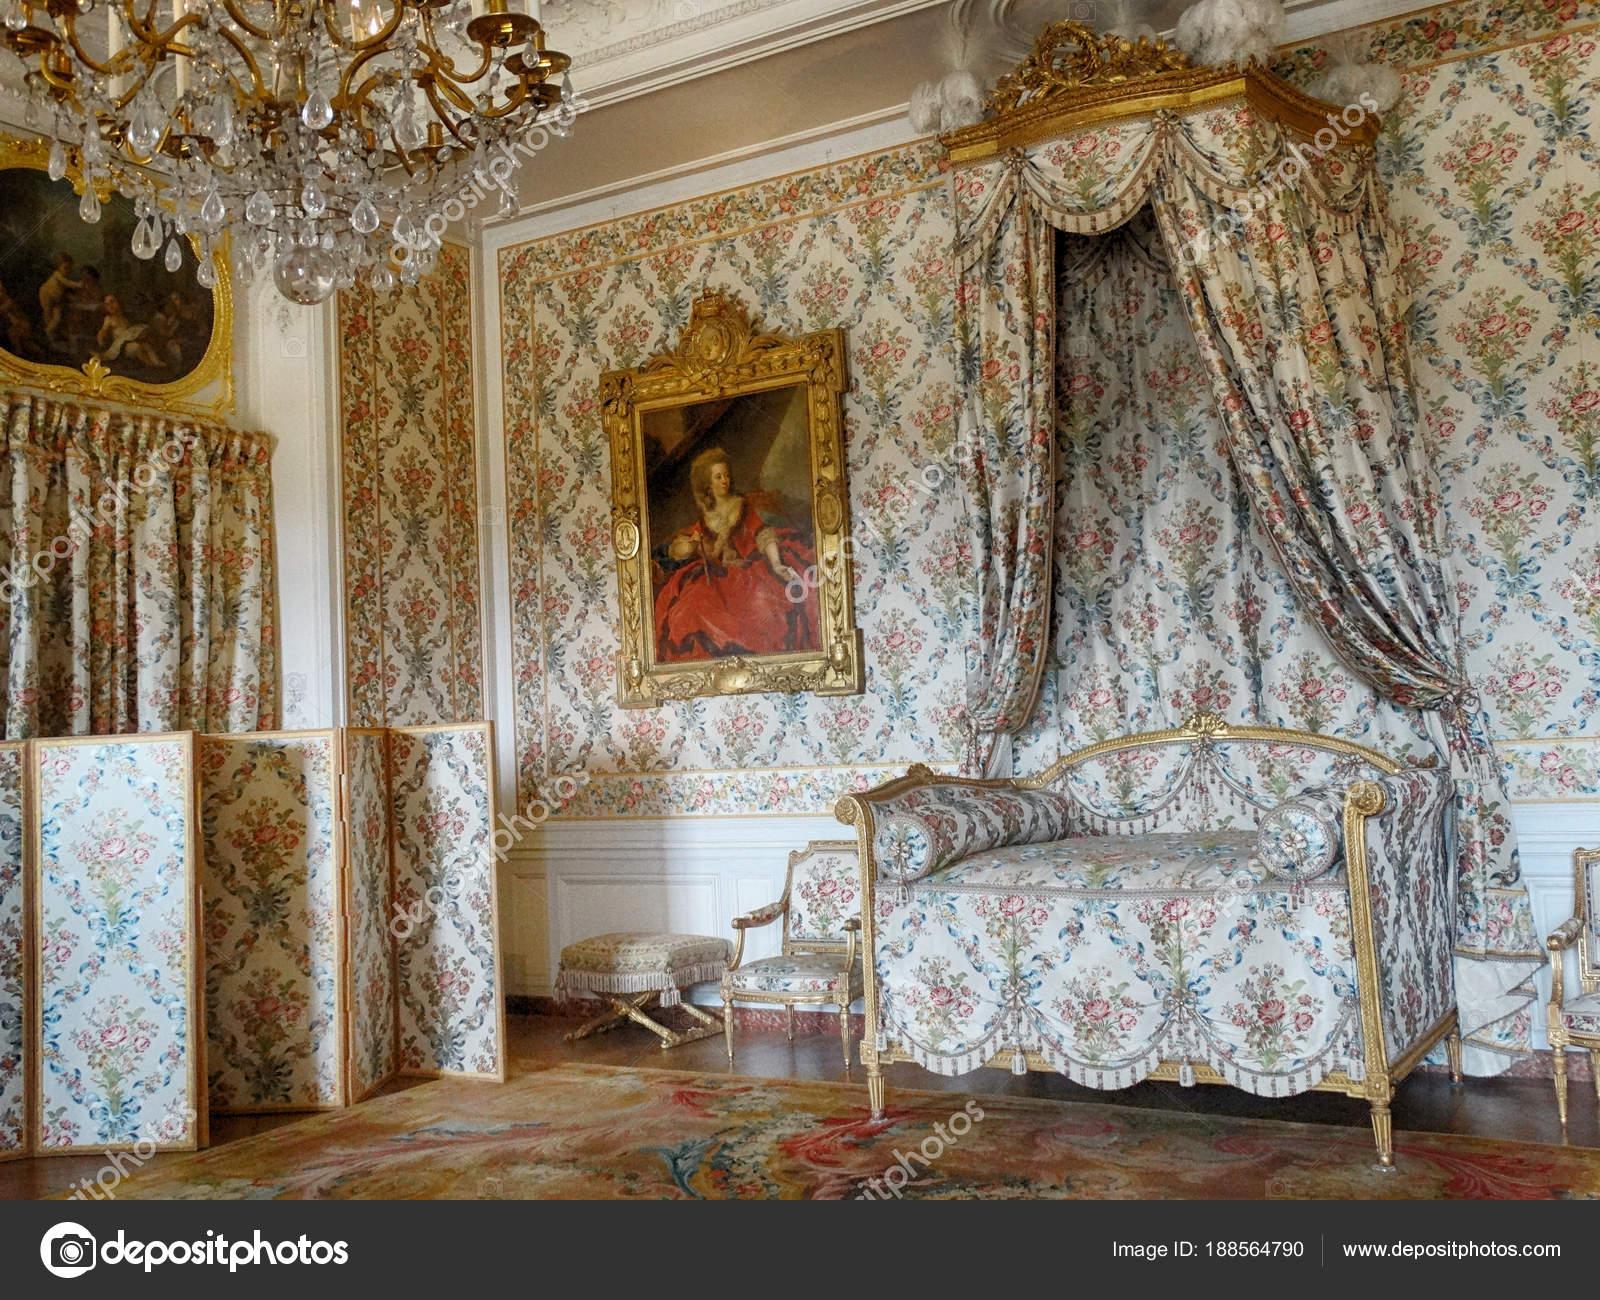 Camera letto nel palazzo versailles parigi francia marzo - Letto versailles ...